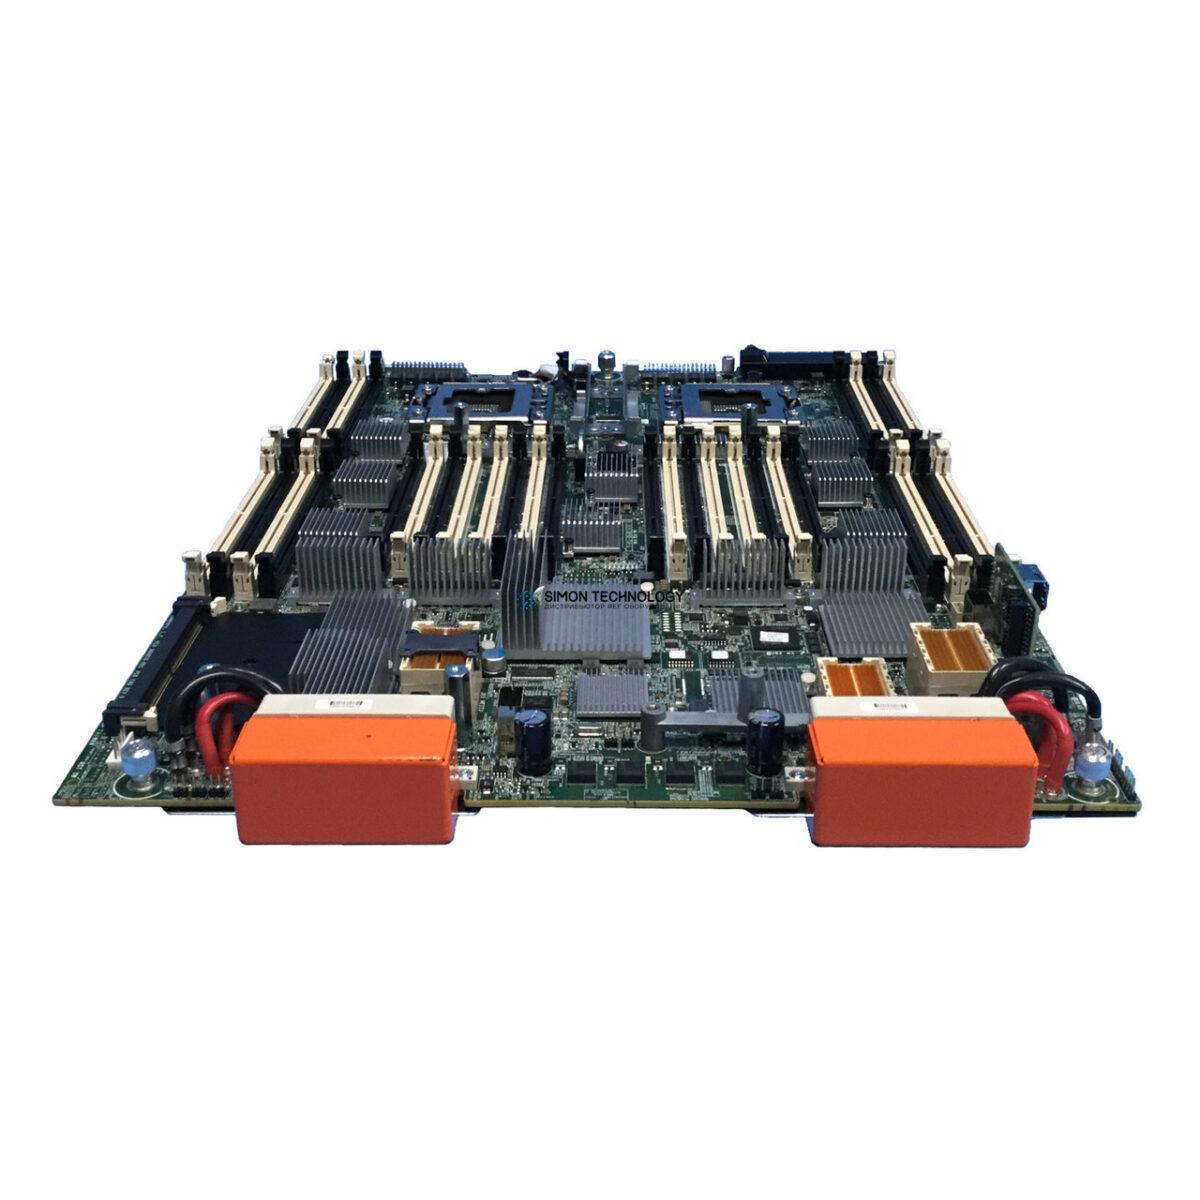 HP HP PROLIANT BL620C G7 SYSTEM BOARD (601517-001)